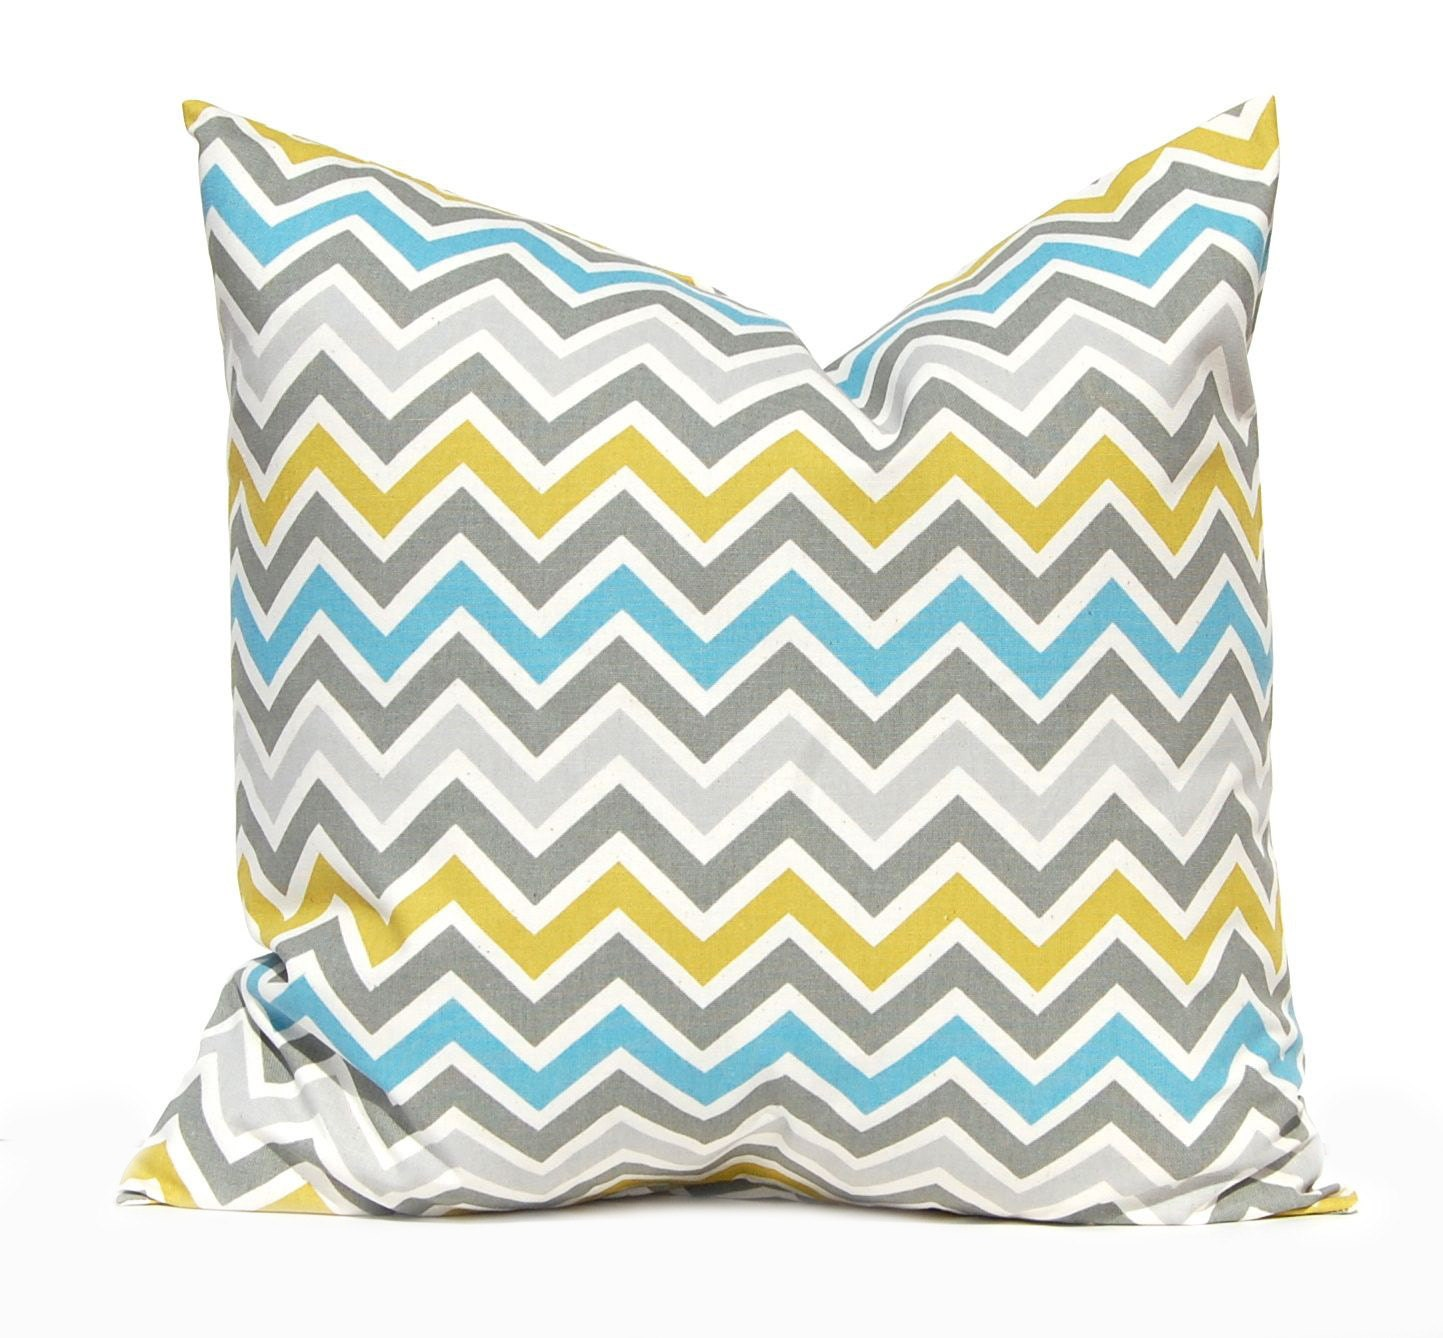 Chevron Pillow Cover Decorative Pillow Covers by CompanyTwentySix